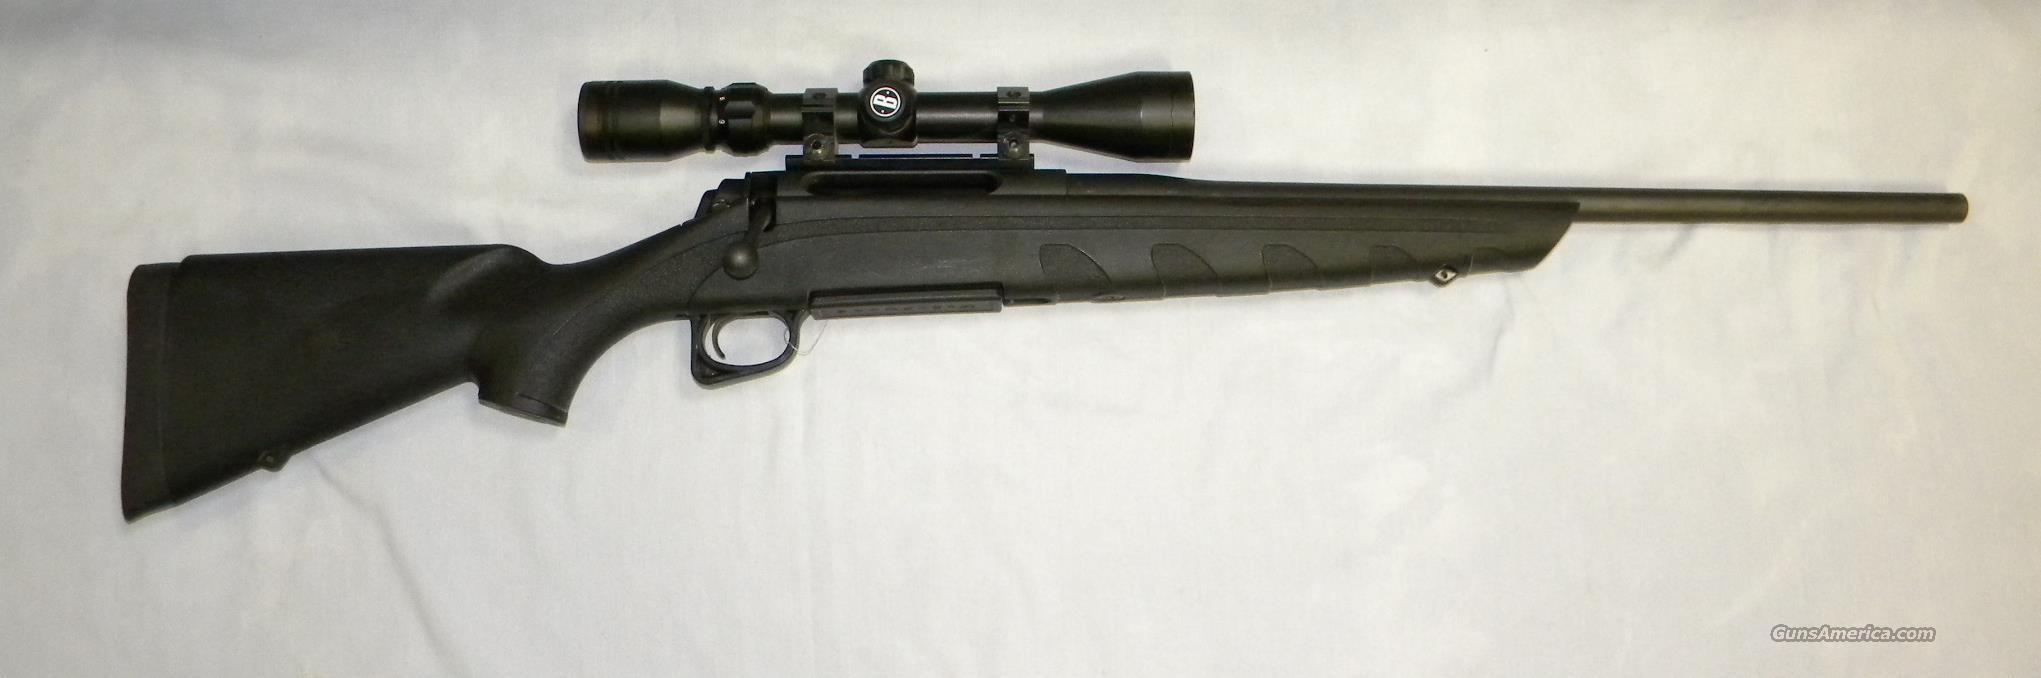 Remington 770, .243 Win, Youth Model, With Factory Scope Pkg  Guns > Rifles > Remington Rifles - Modern > Bolt Action Non-Model 700 > Sporting